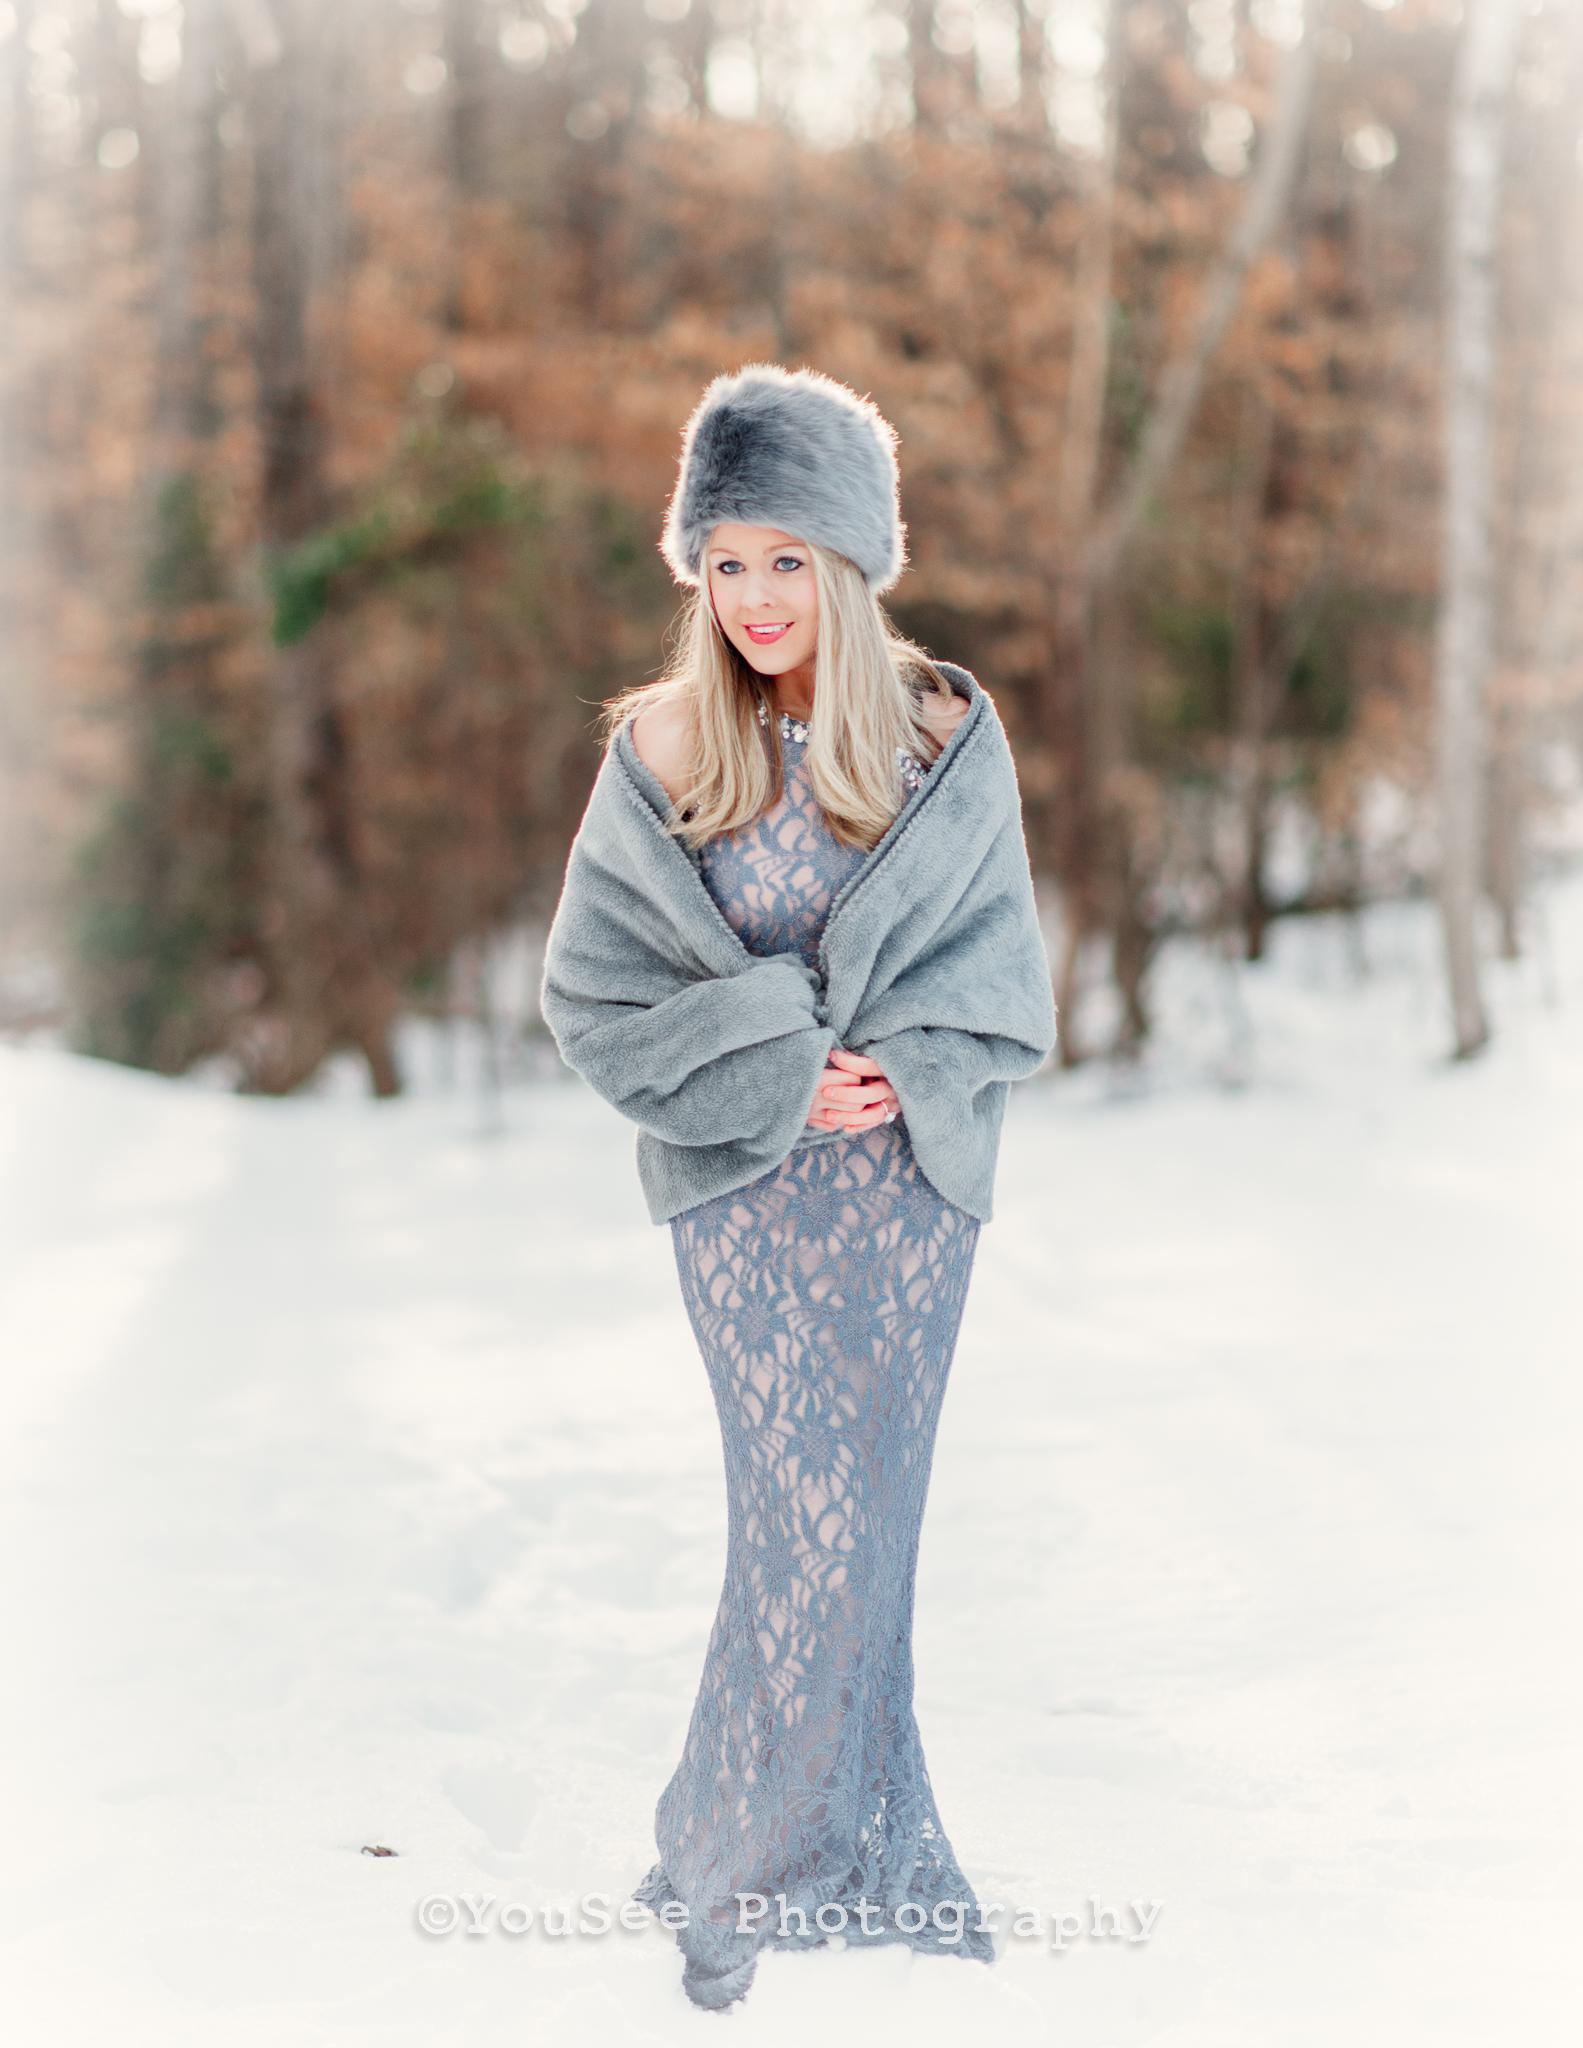 seniorportrait_fredericksburg_photography_winter2 (3)